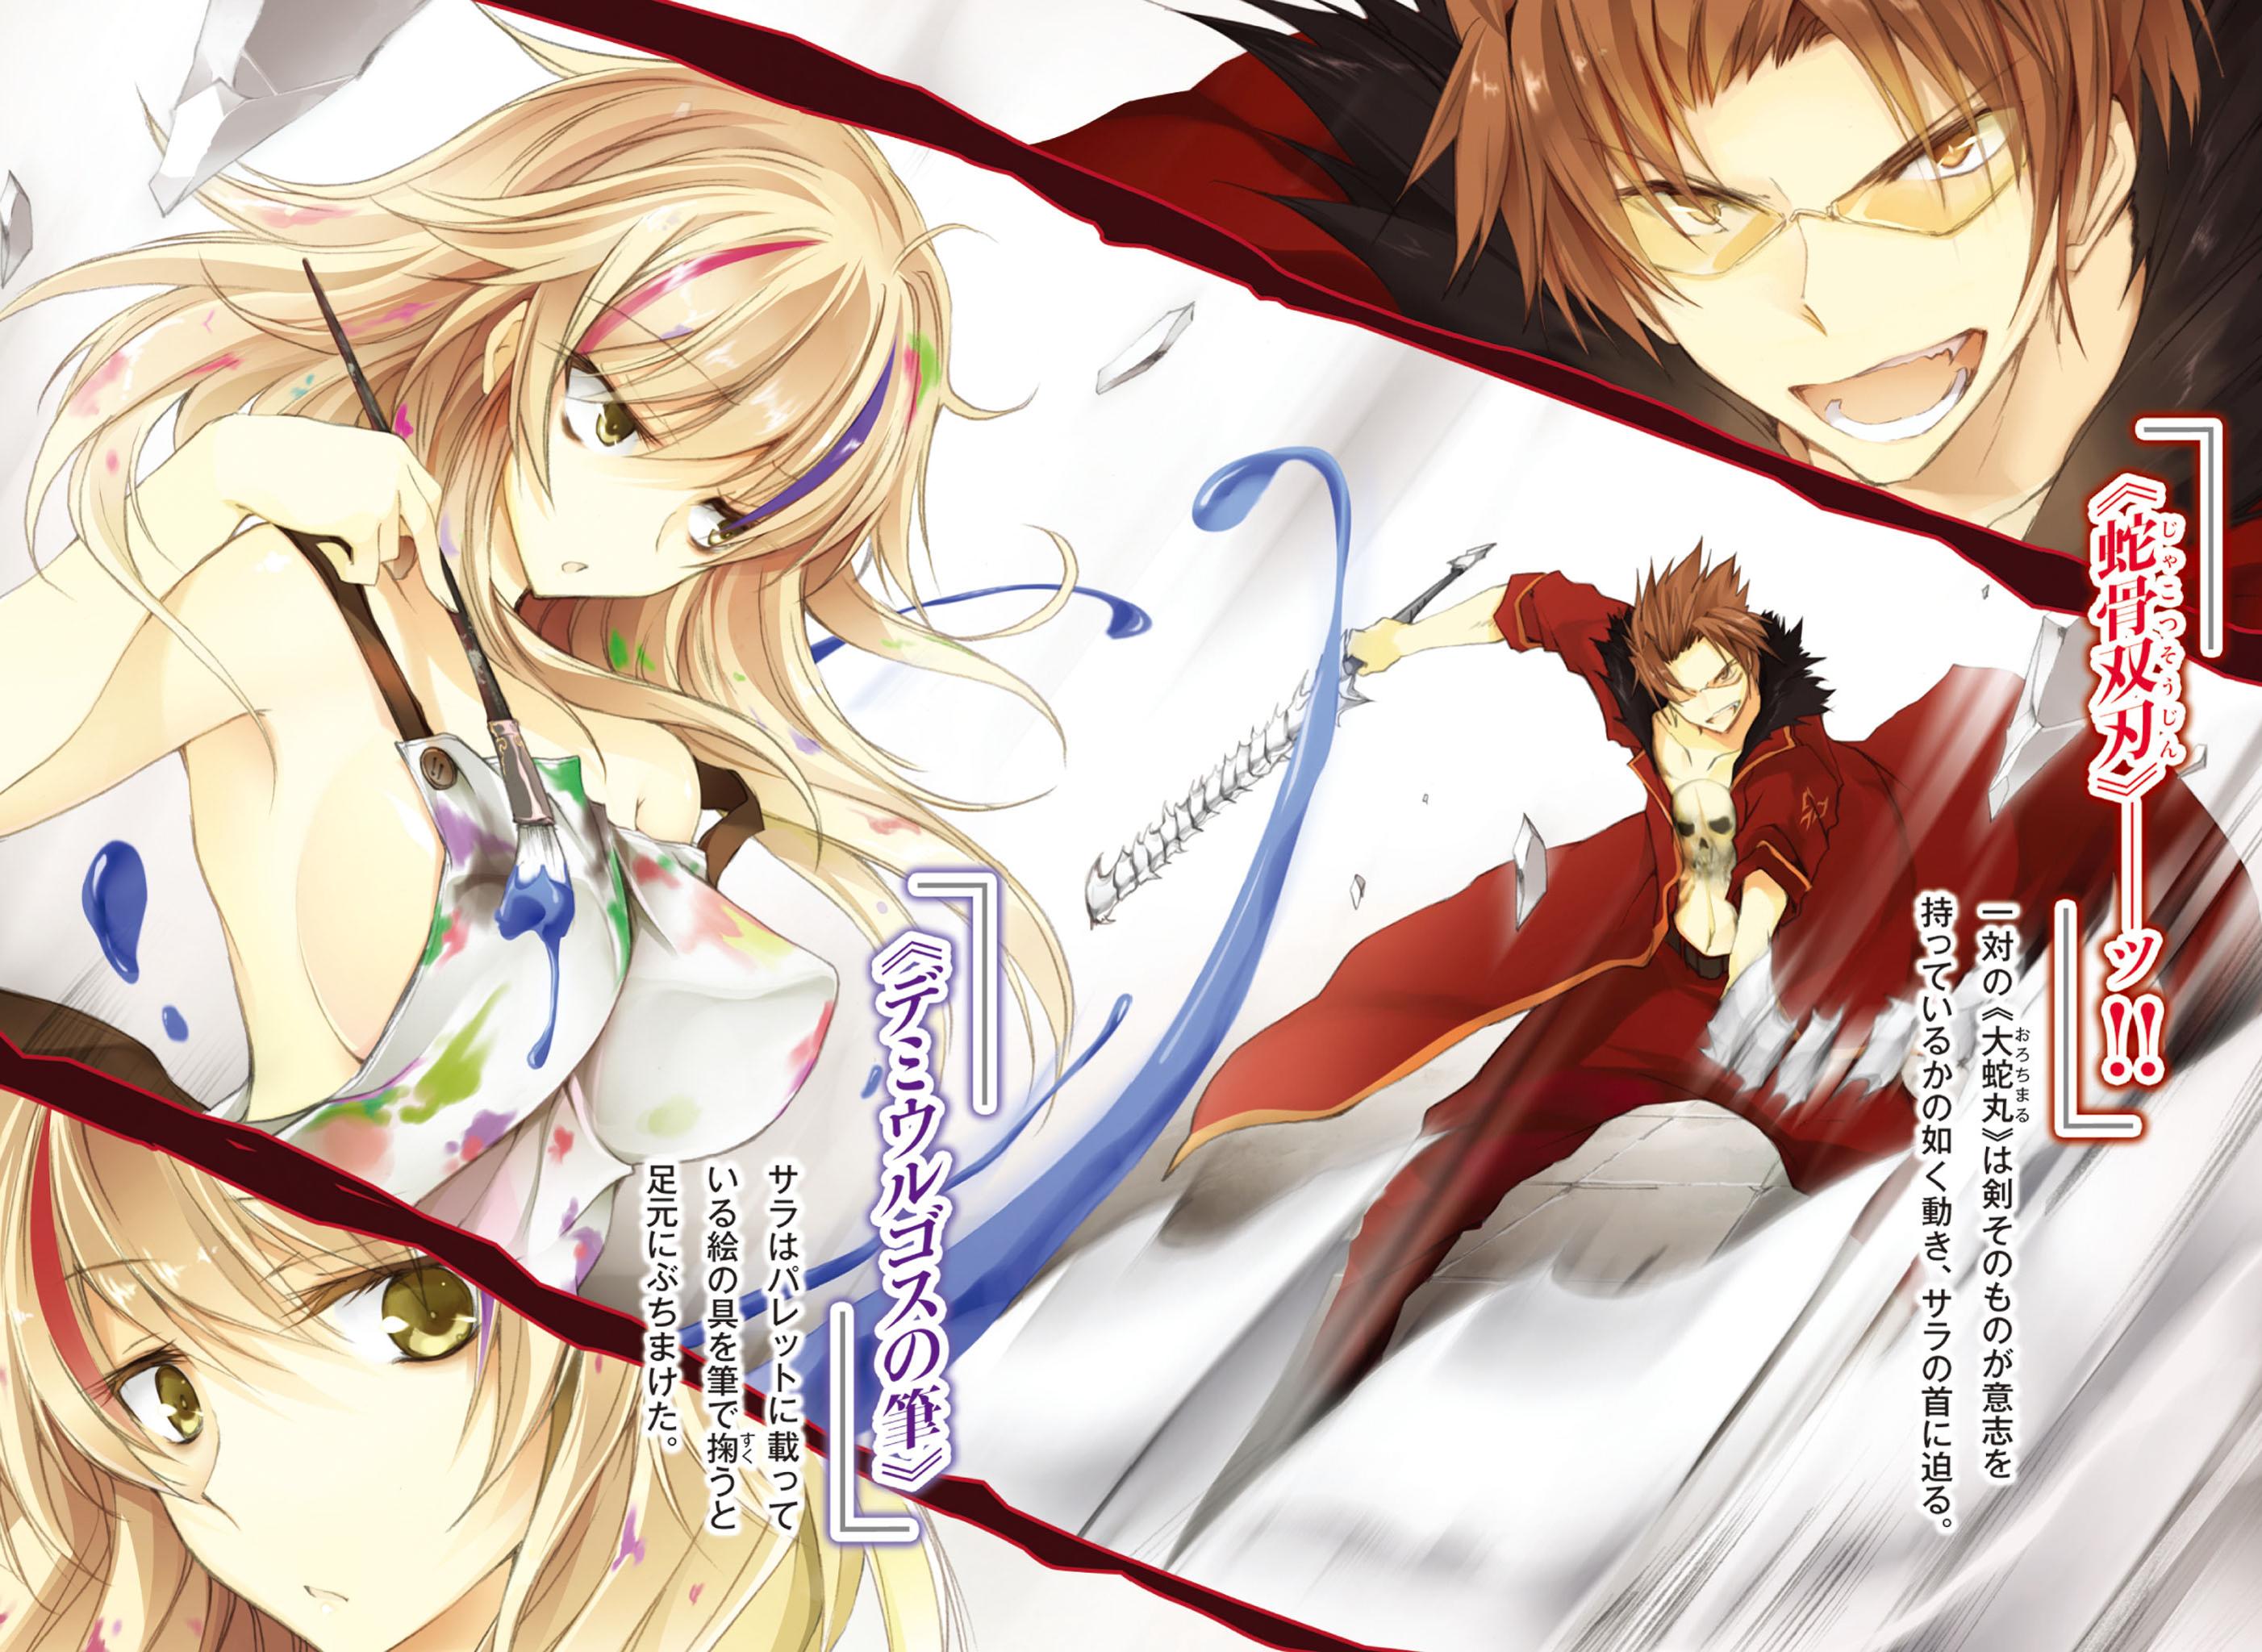 File:Rakudai Kishi no Chivalry Volume 6 Colour 04.jpg